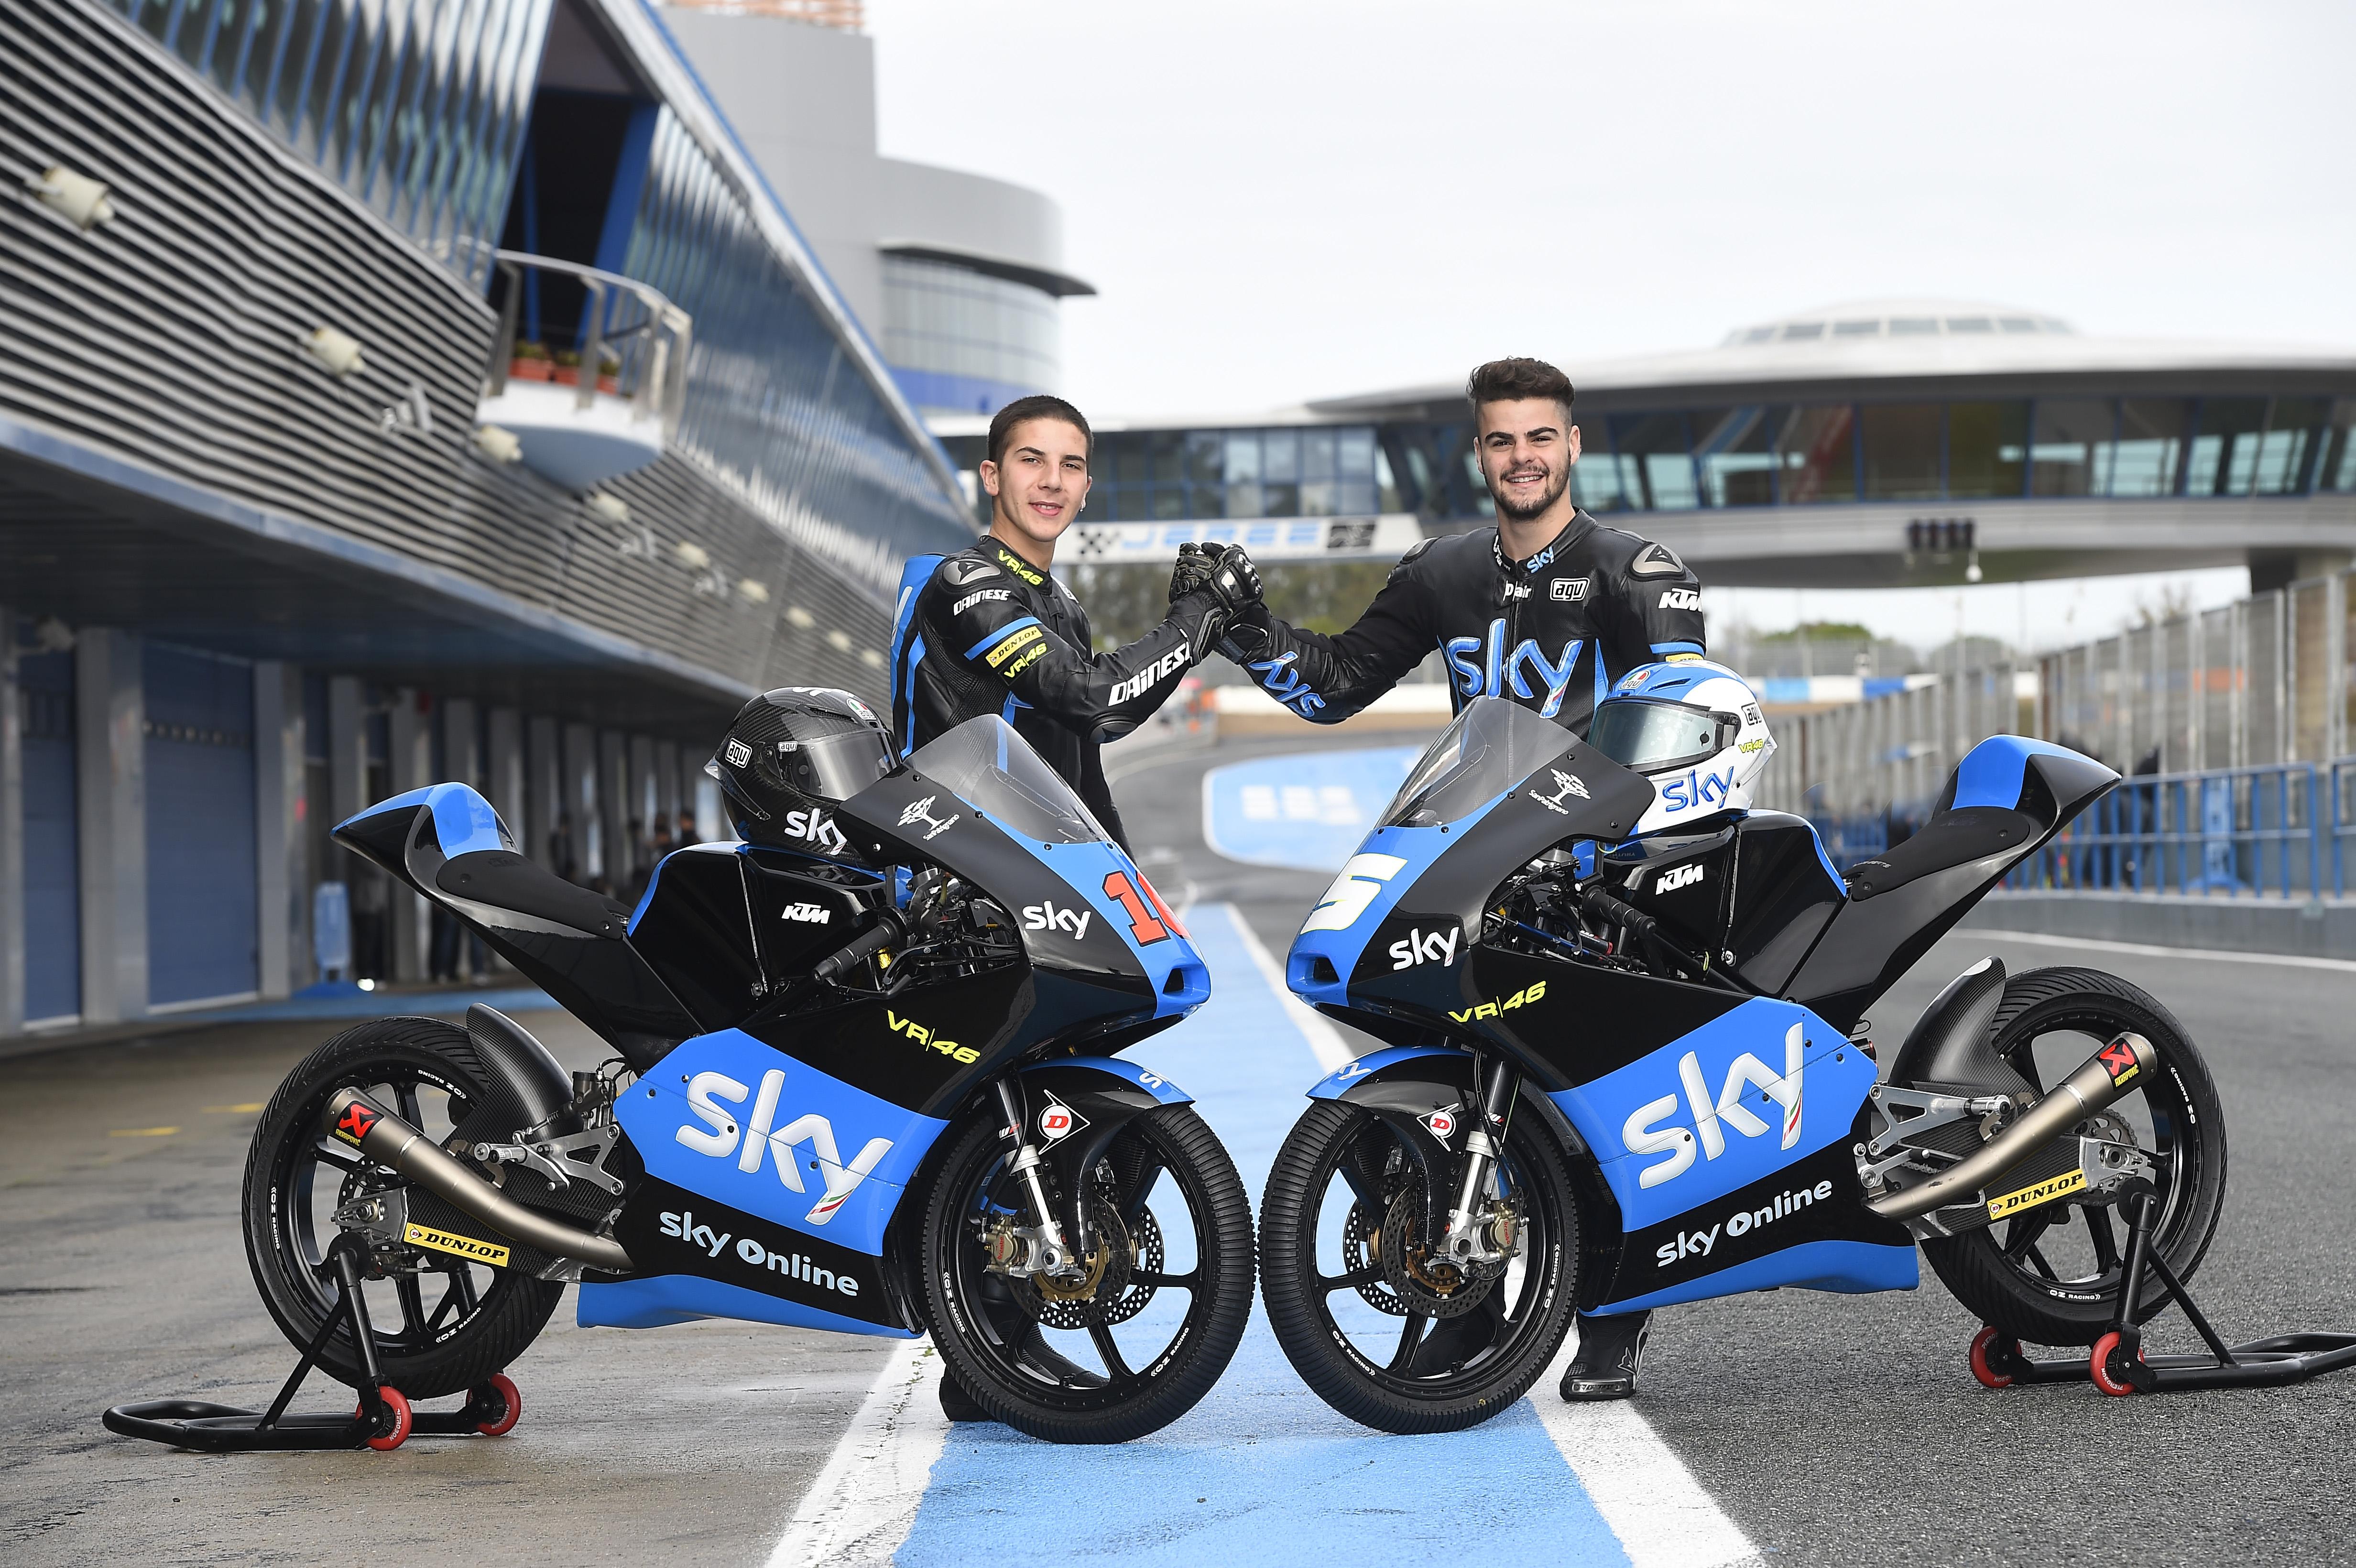 Sky Racing Team VR46: test ok per Fenati e Migno